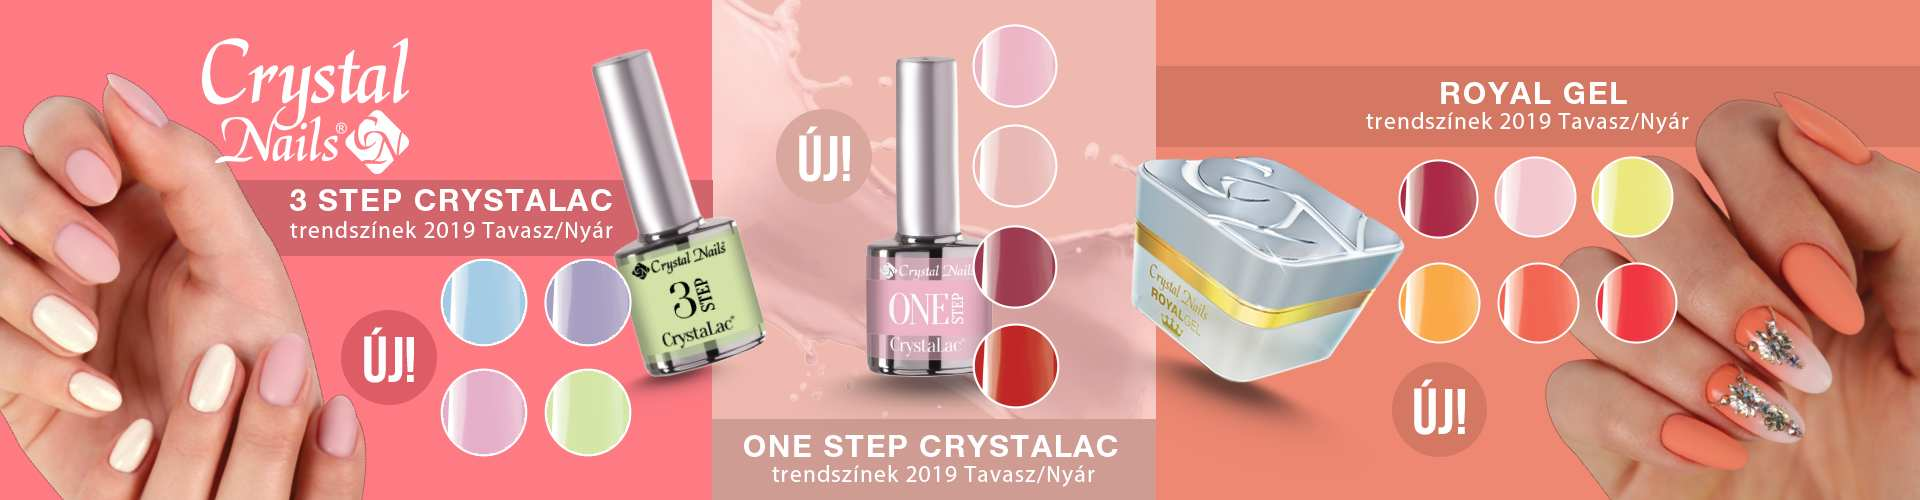 140_3_step_one_step_royal